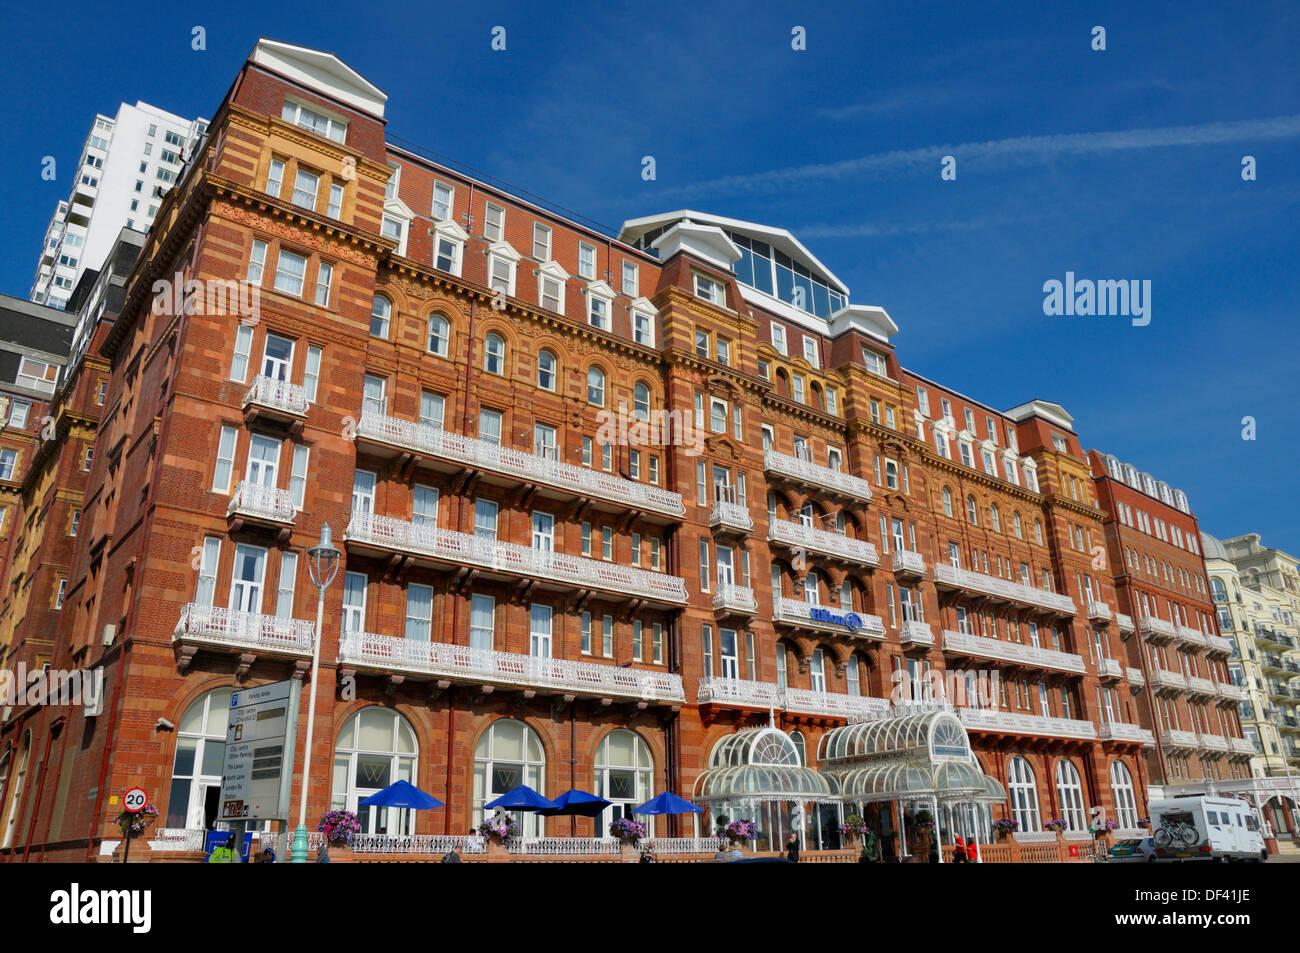 Brighton, East Sussex, England, UK. Hotel Hilton Brighton Metropole Stockbild